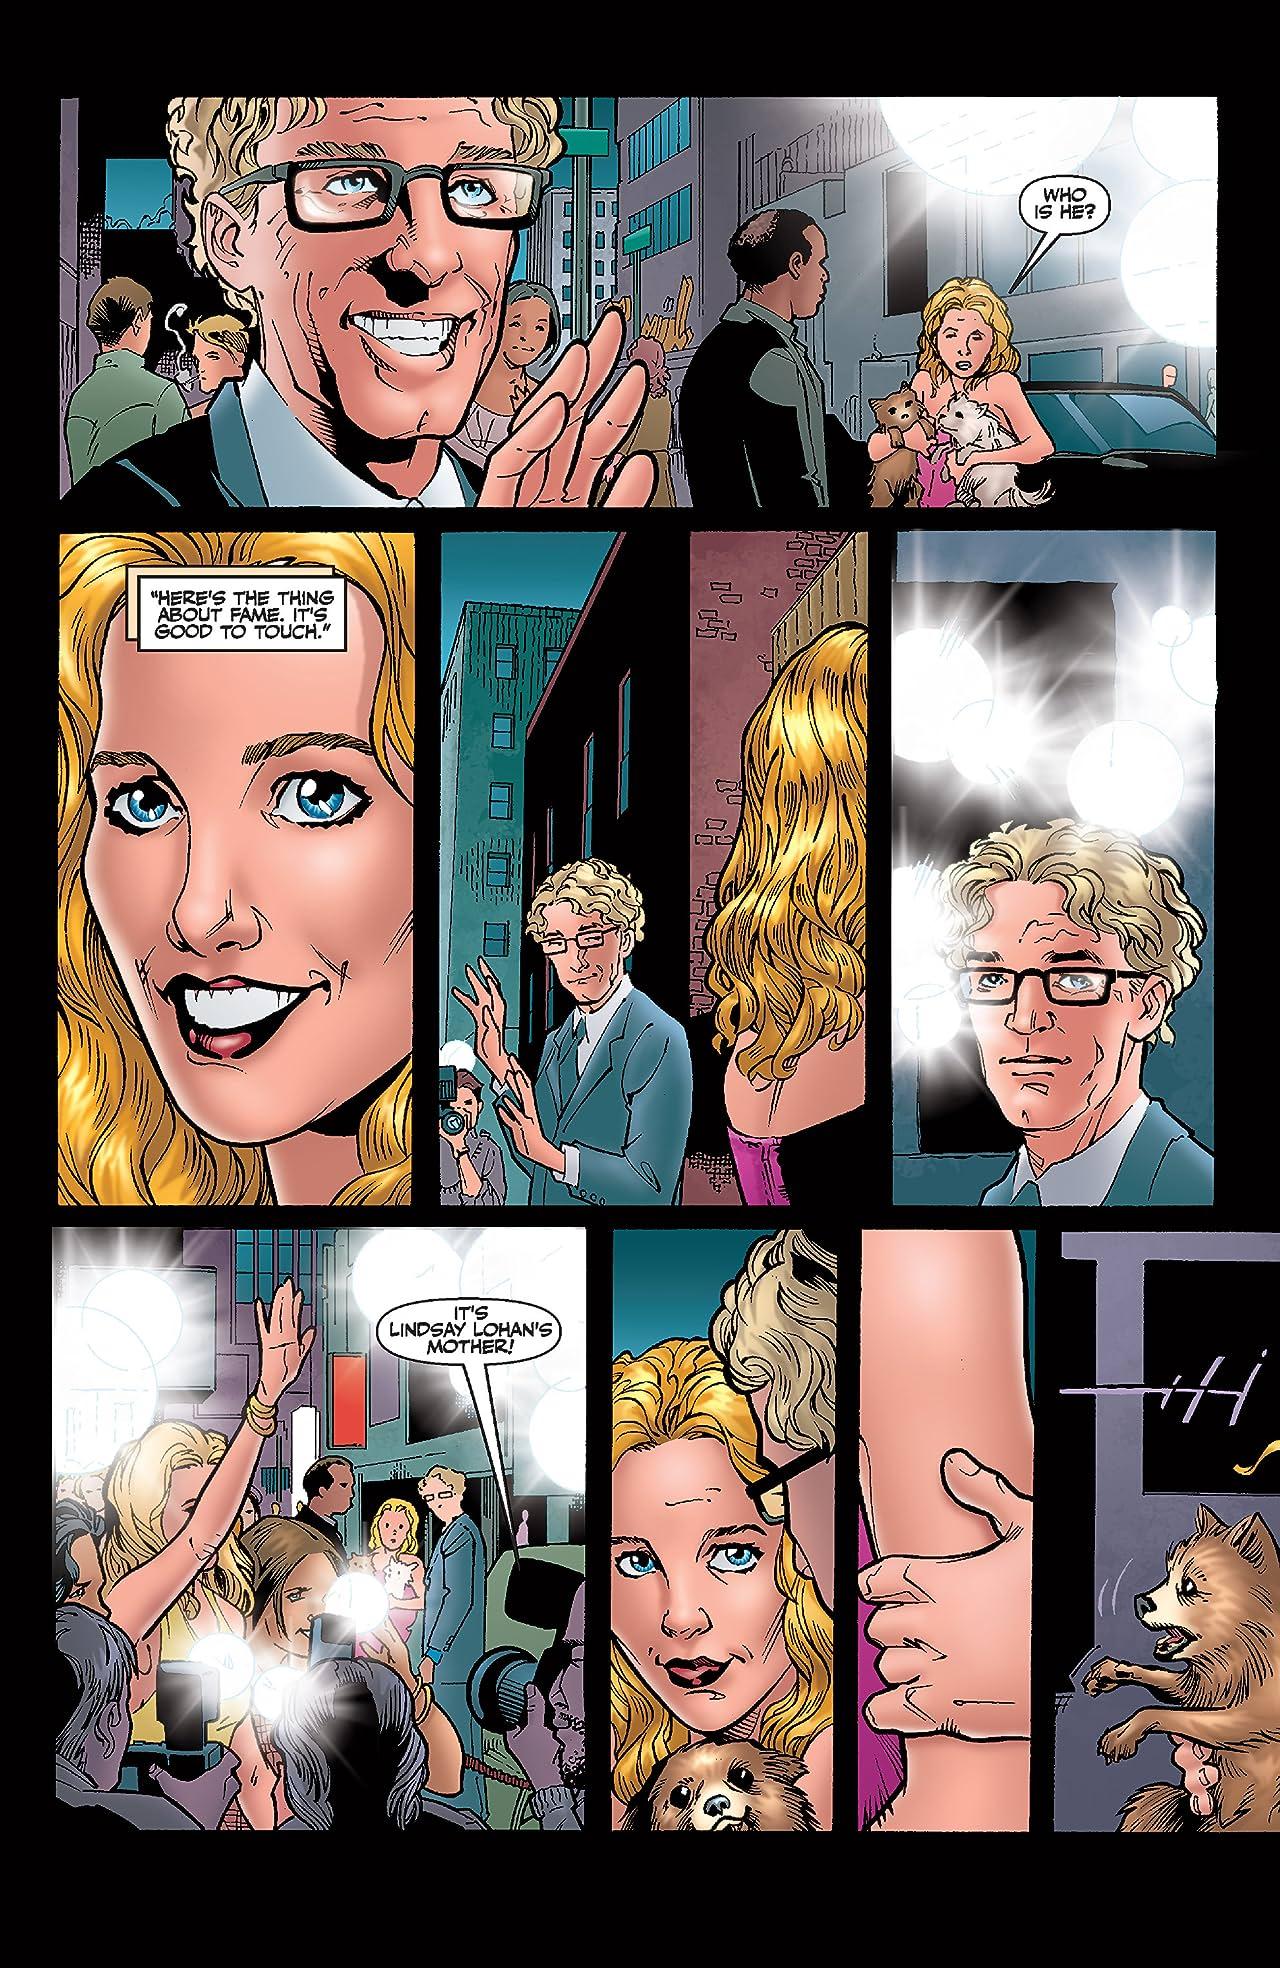 Buffy the Vampire Slayer: Season 8 #21